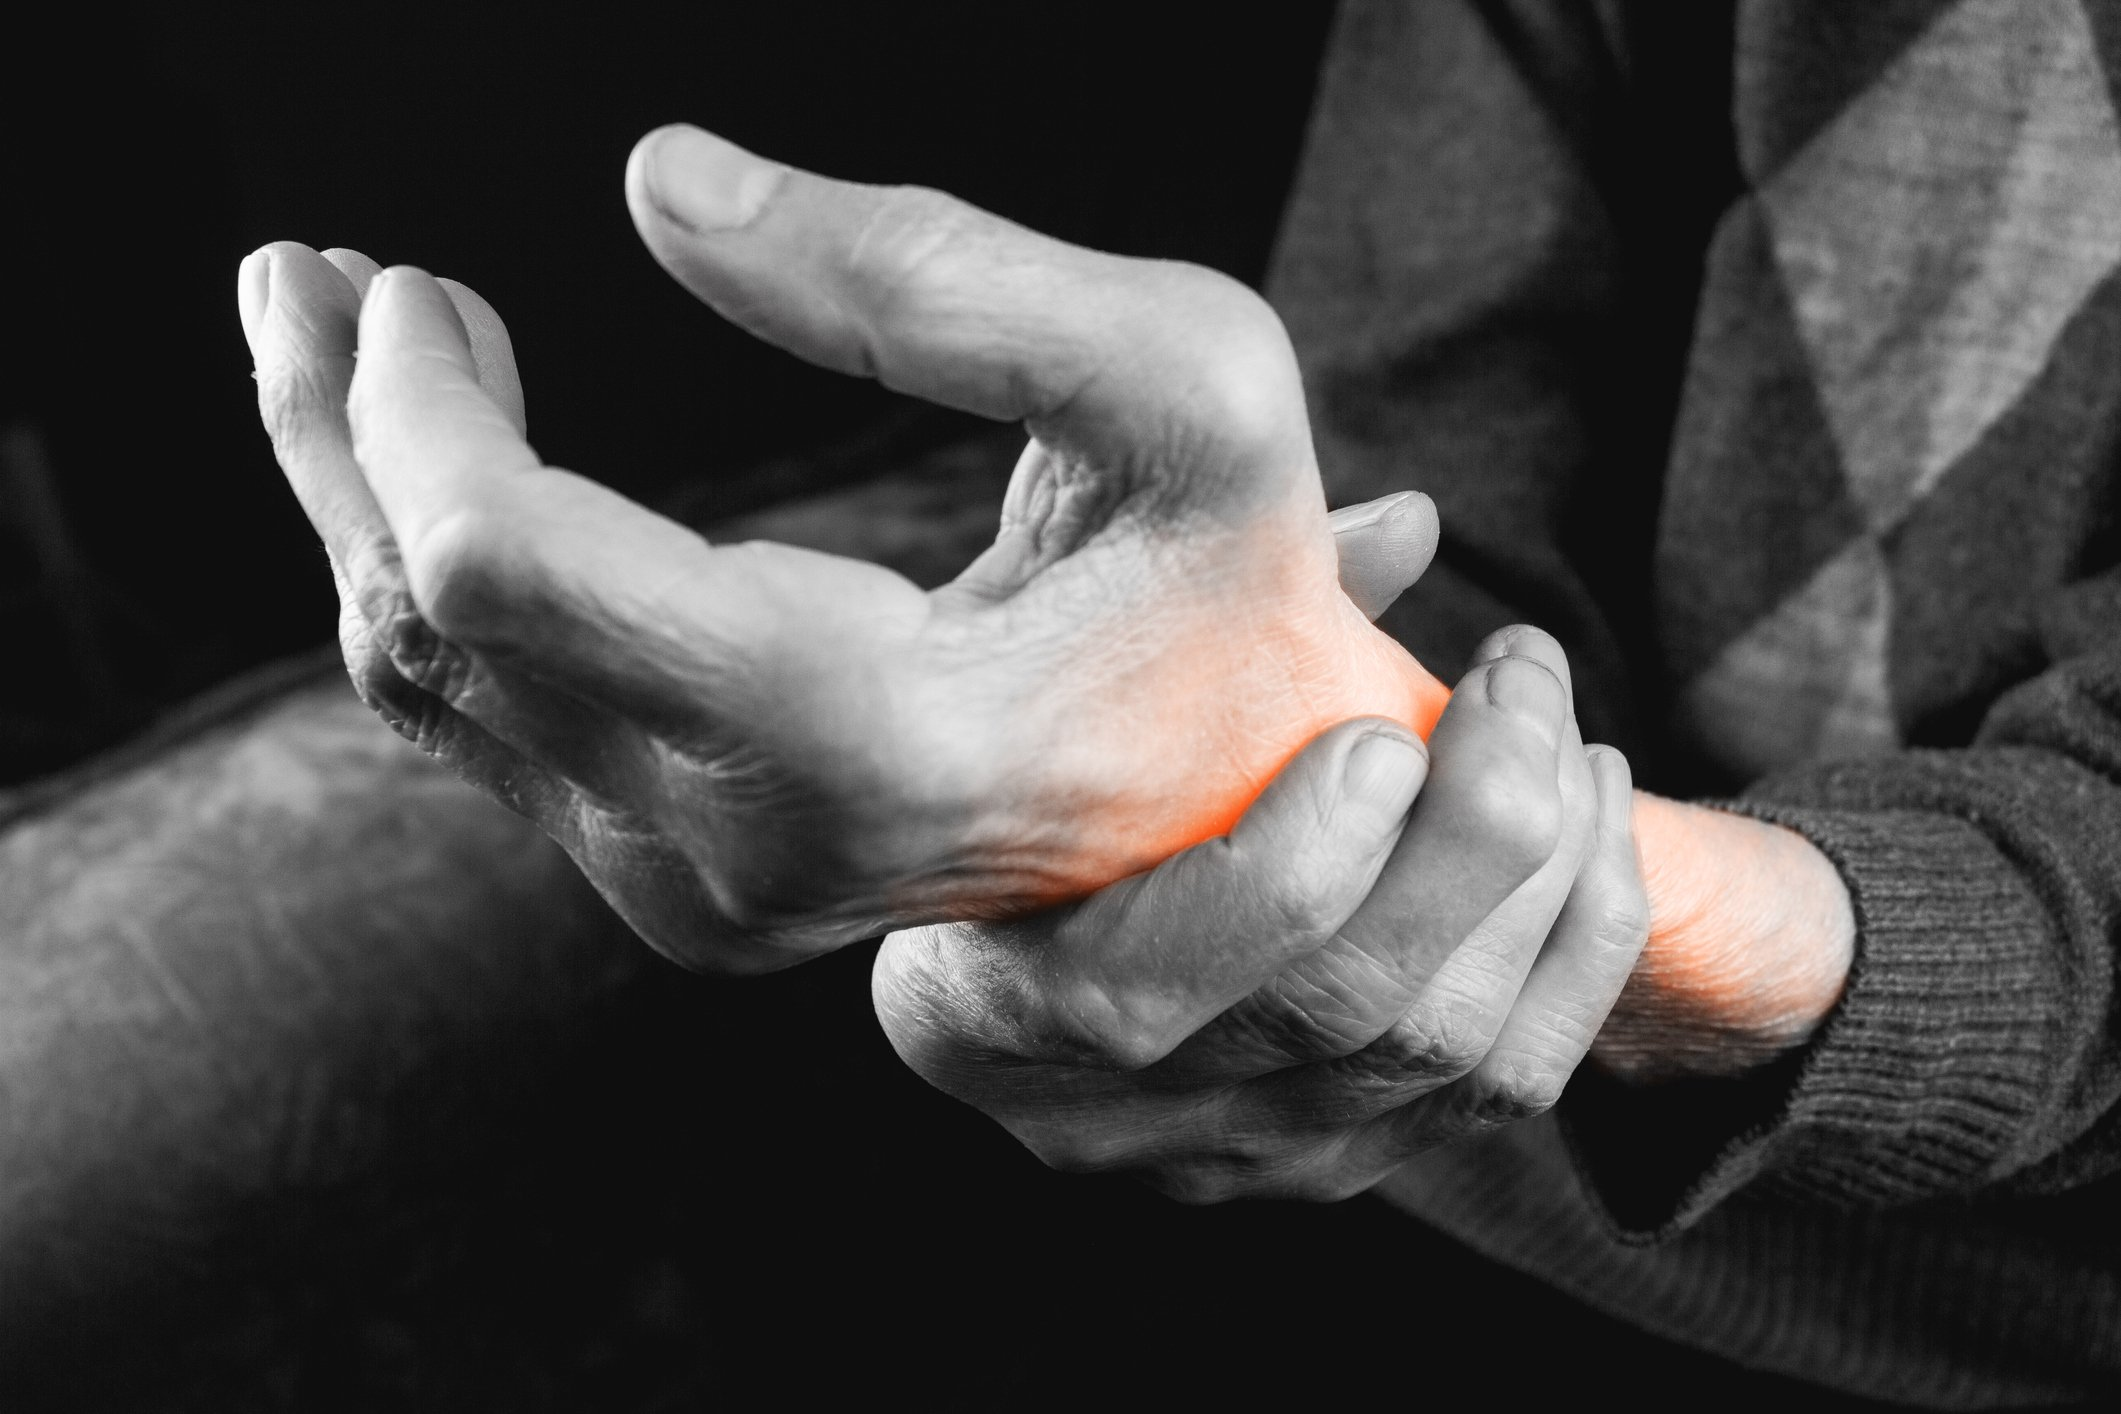 tratamentul fizic tratament articular analize ale tratamentului reumatismului articular